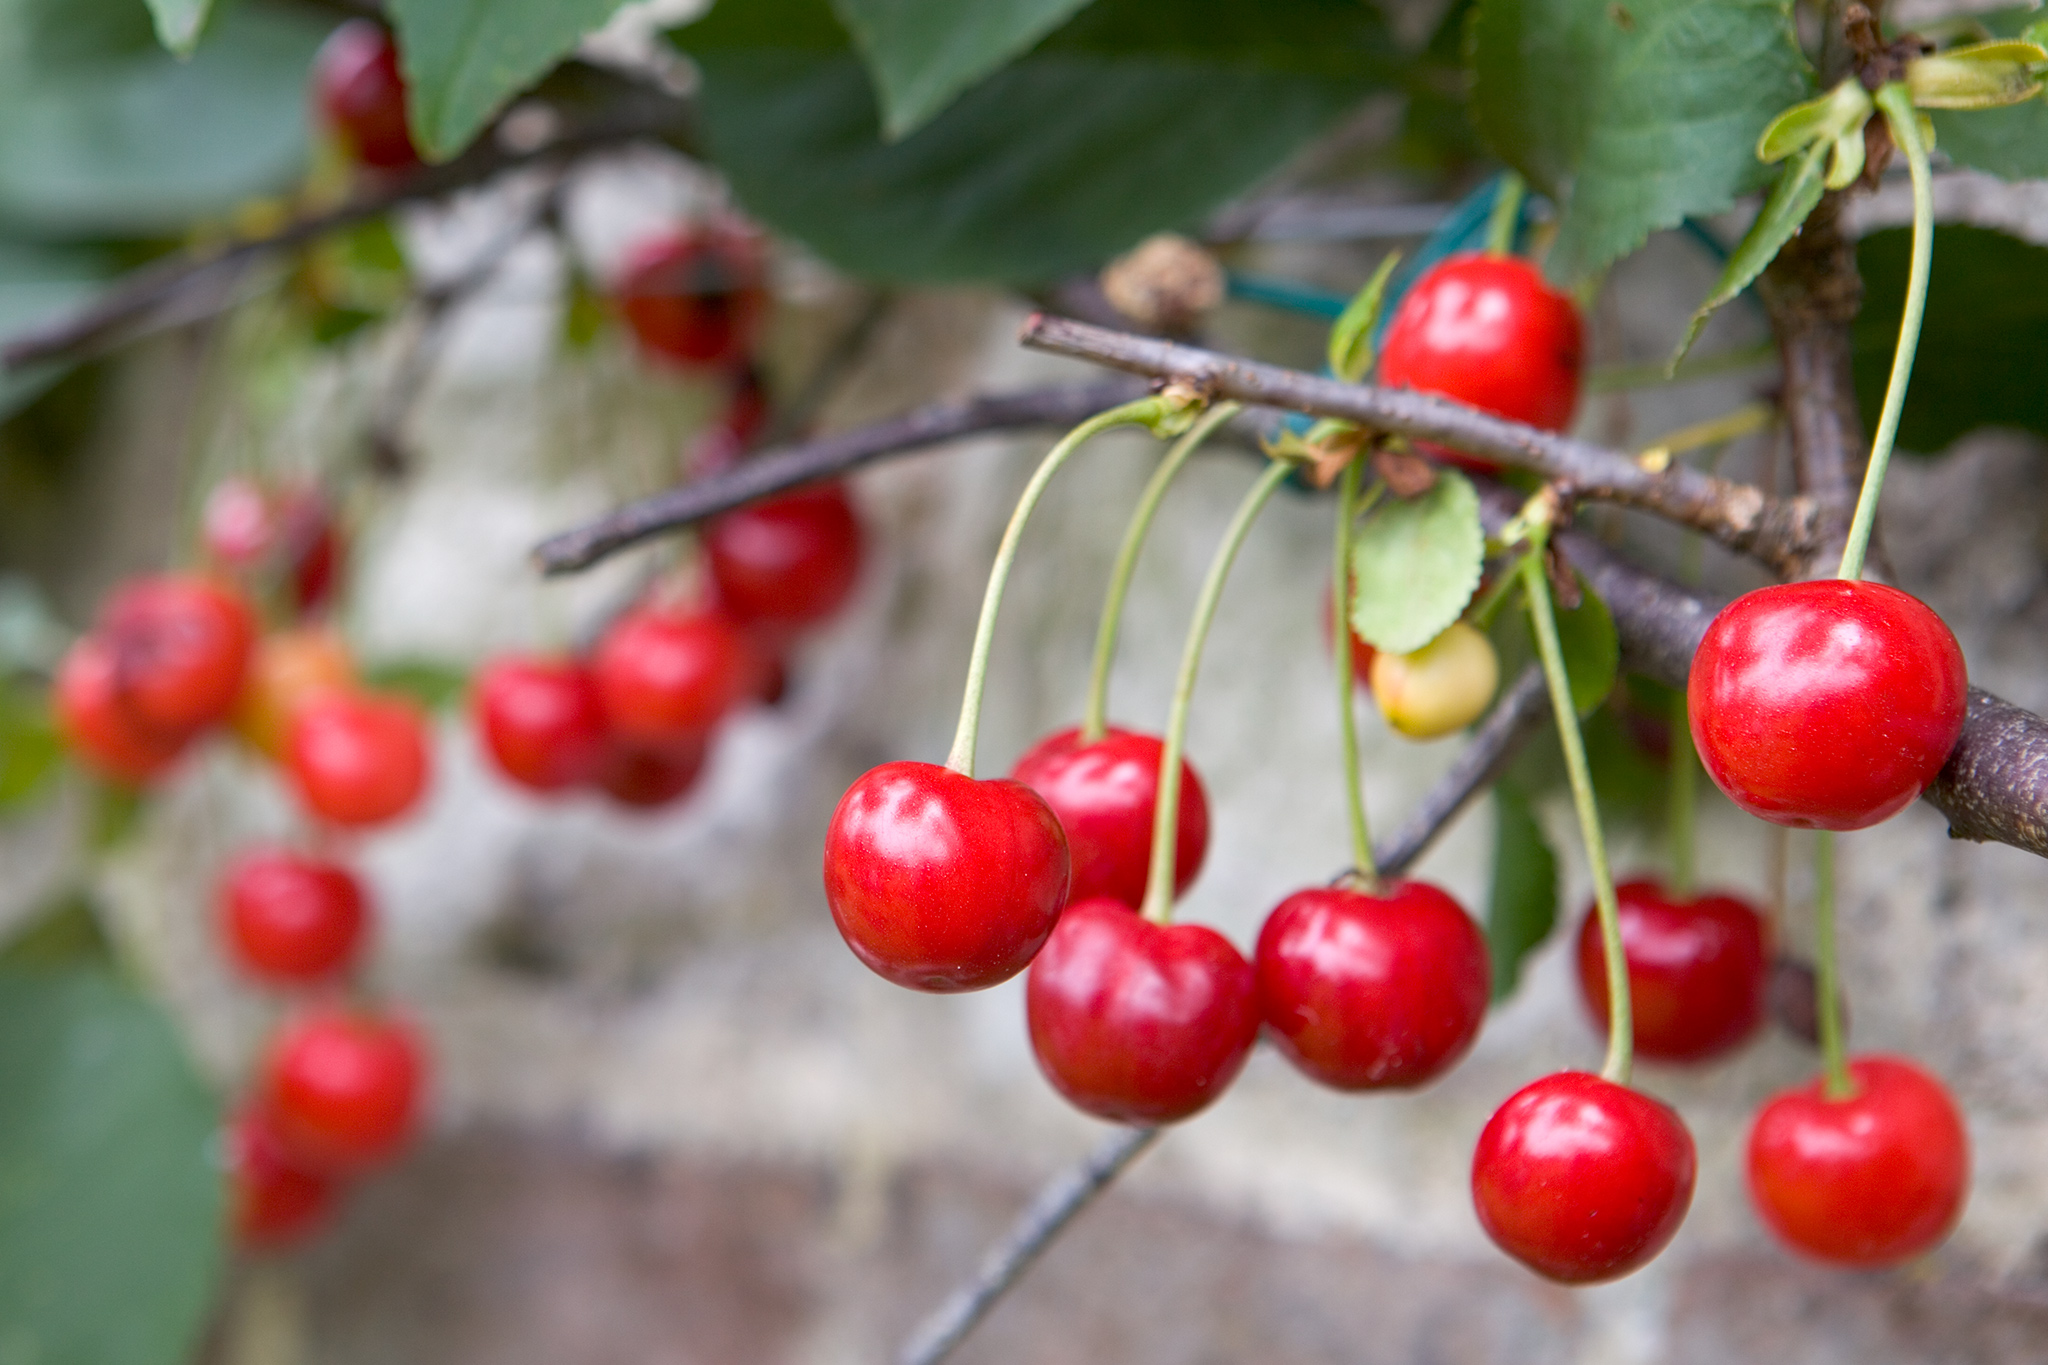 cherries-ready-to-pick-2